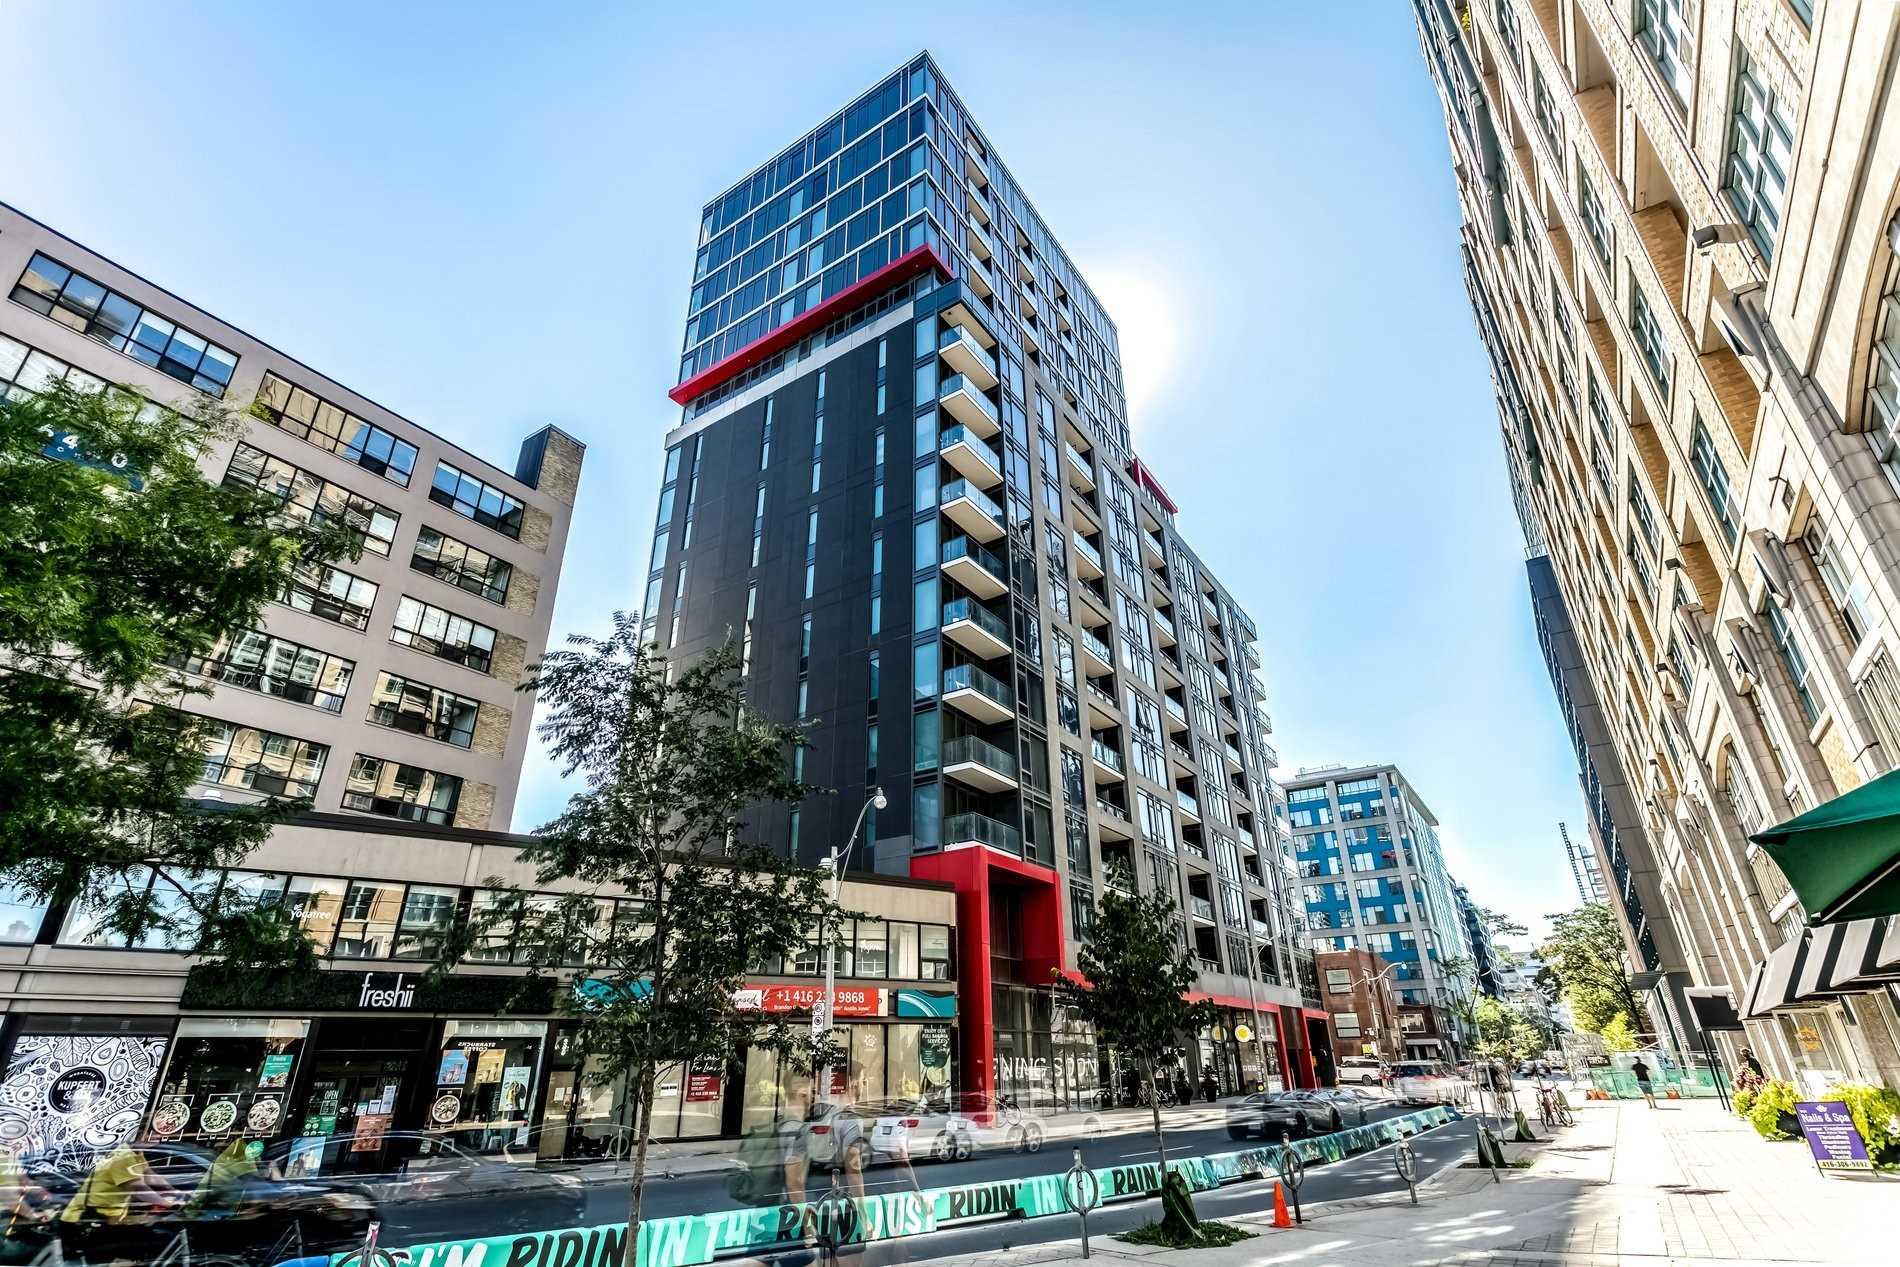 435 Richmond St, Toronto, Ontario M5V 0N1, 3 Bedrooms Bedrooms, 9 Rooms Rooms,3 BathroomsBathrooms,Condo Apt,For Sale,Richmond,C5355903